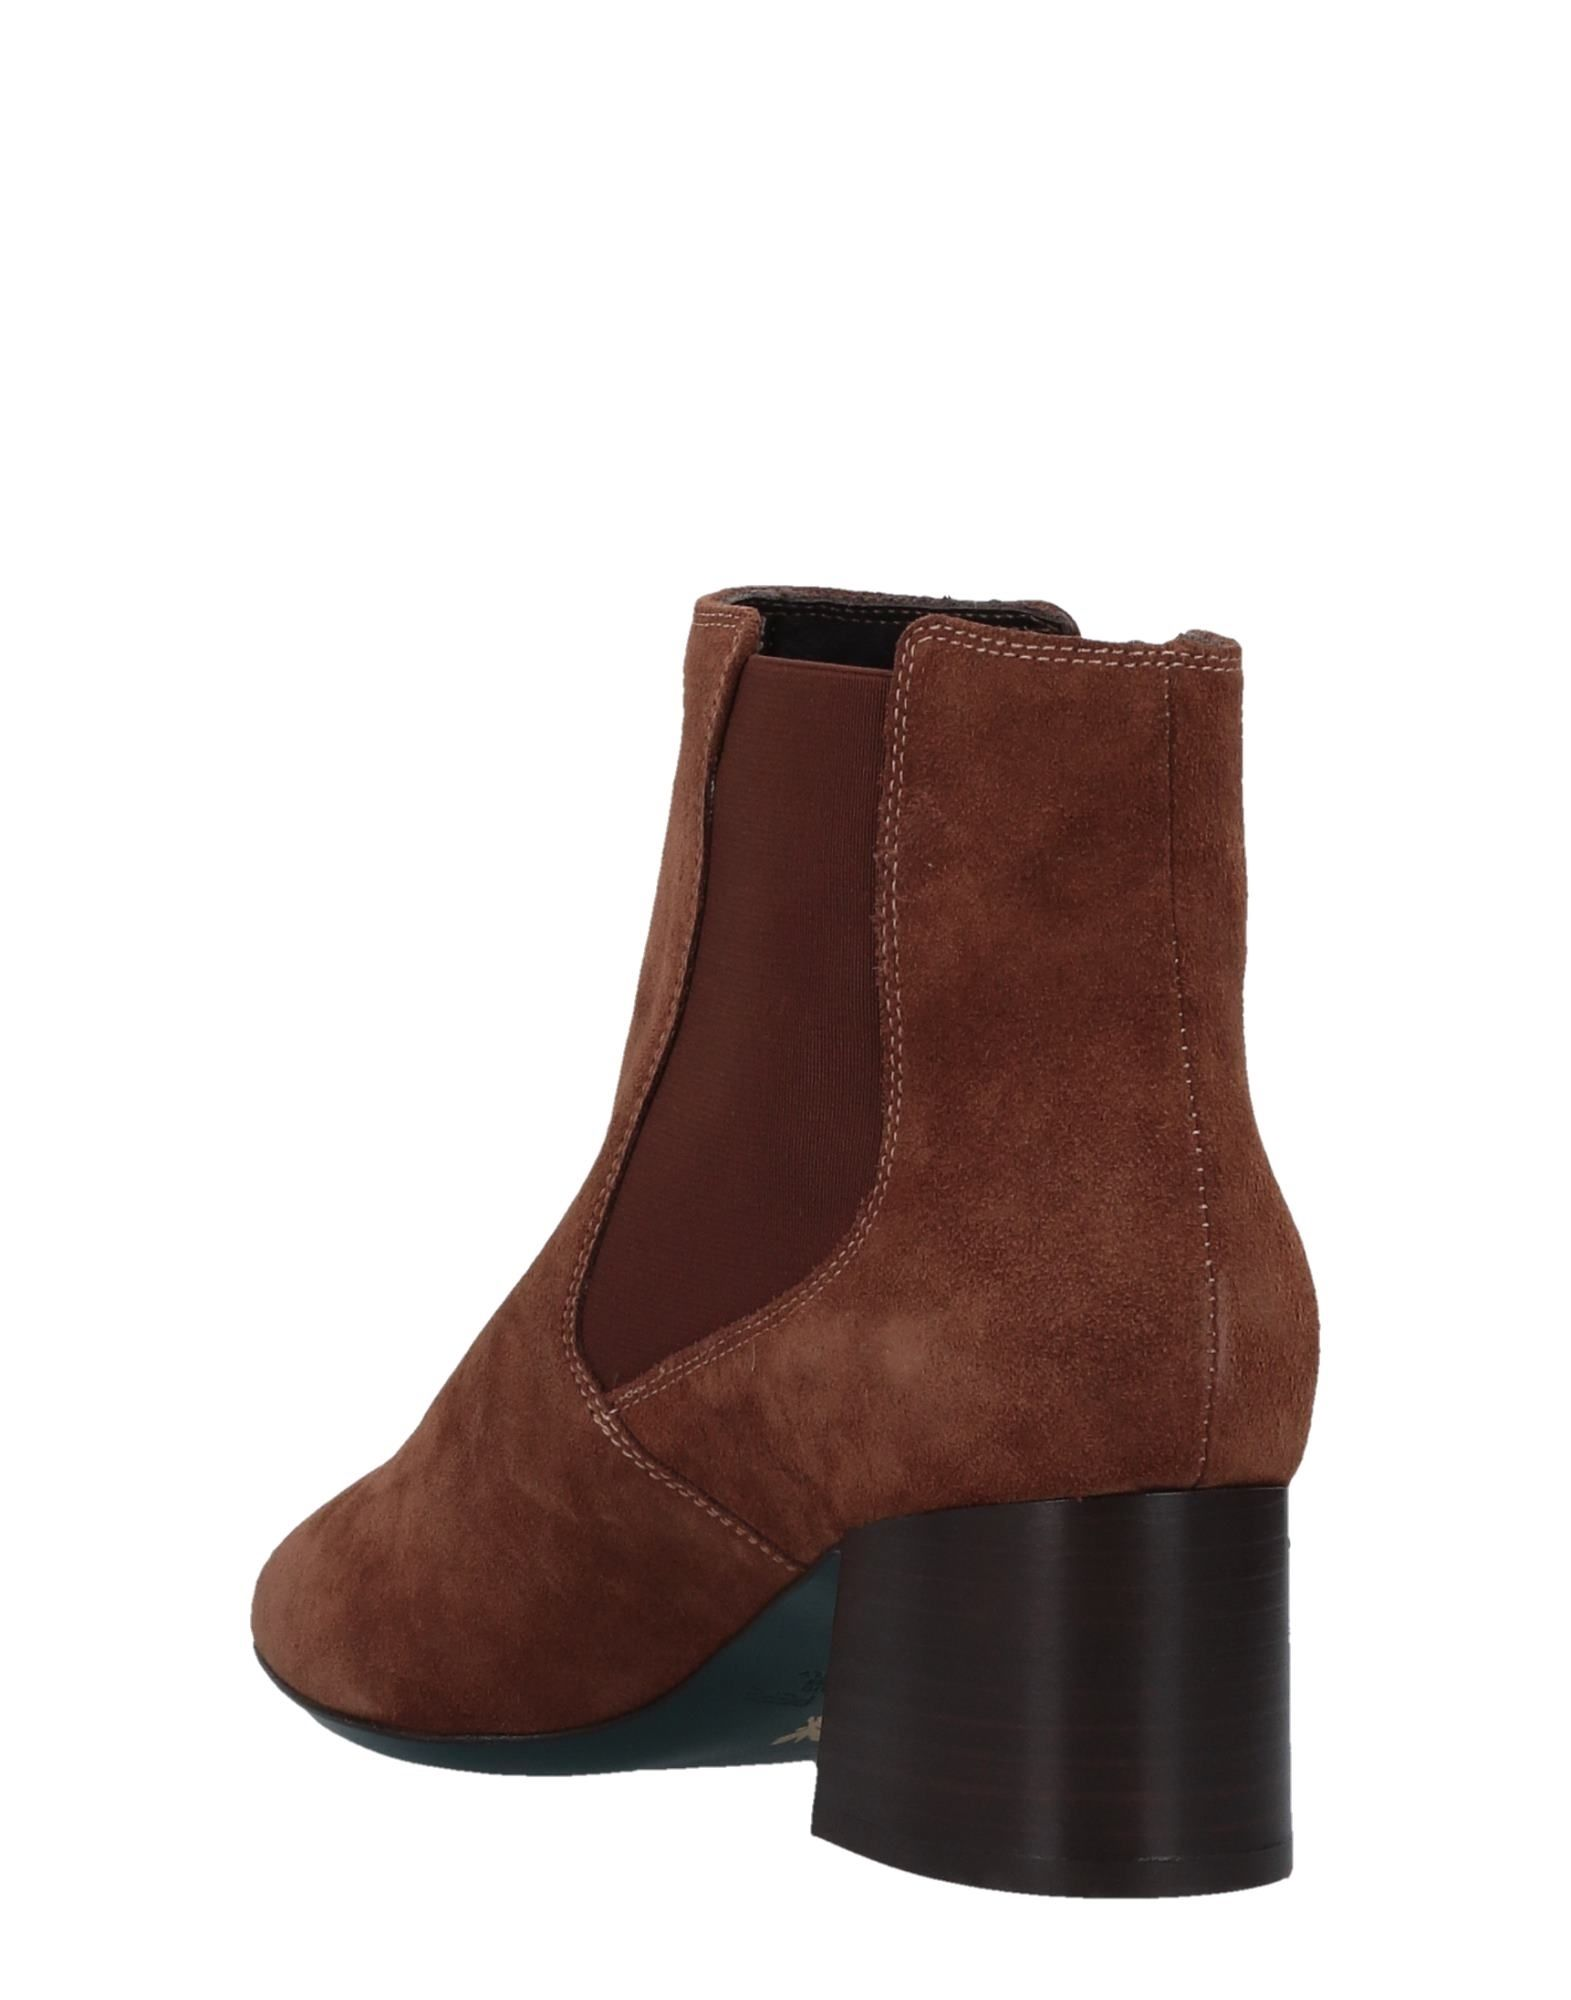 Stilvolle billige Schuhe Patrizia Pepe Chelsea Chelsea Chelsea Boots Damen  11512029KV 1230b4